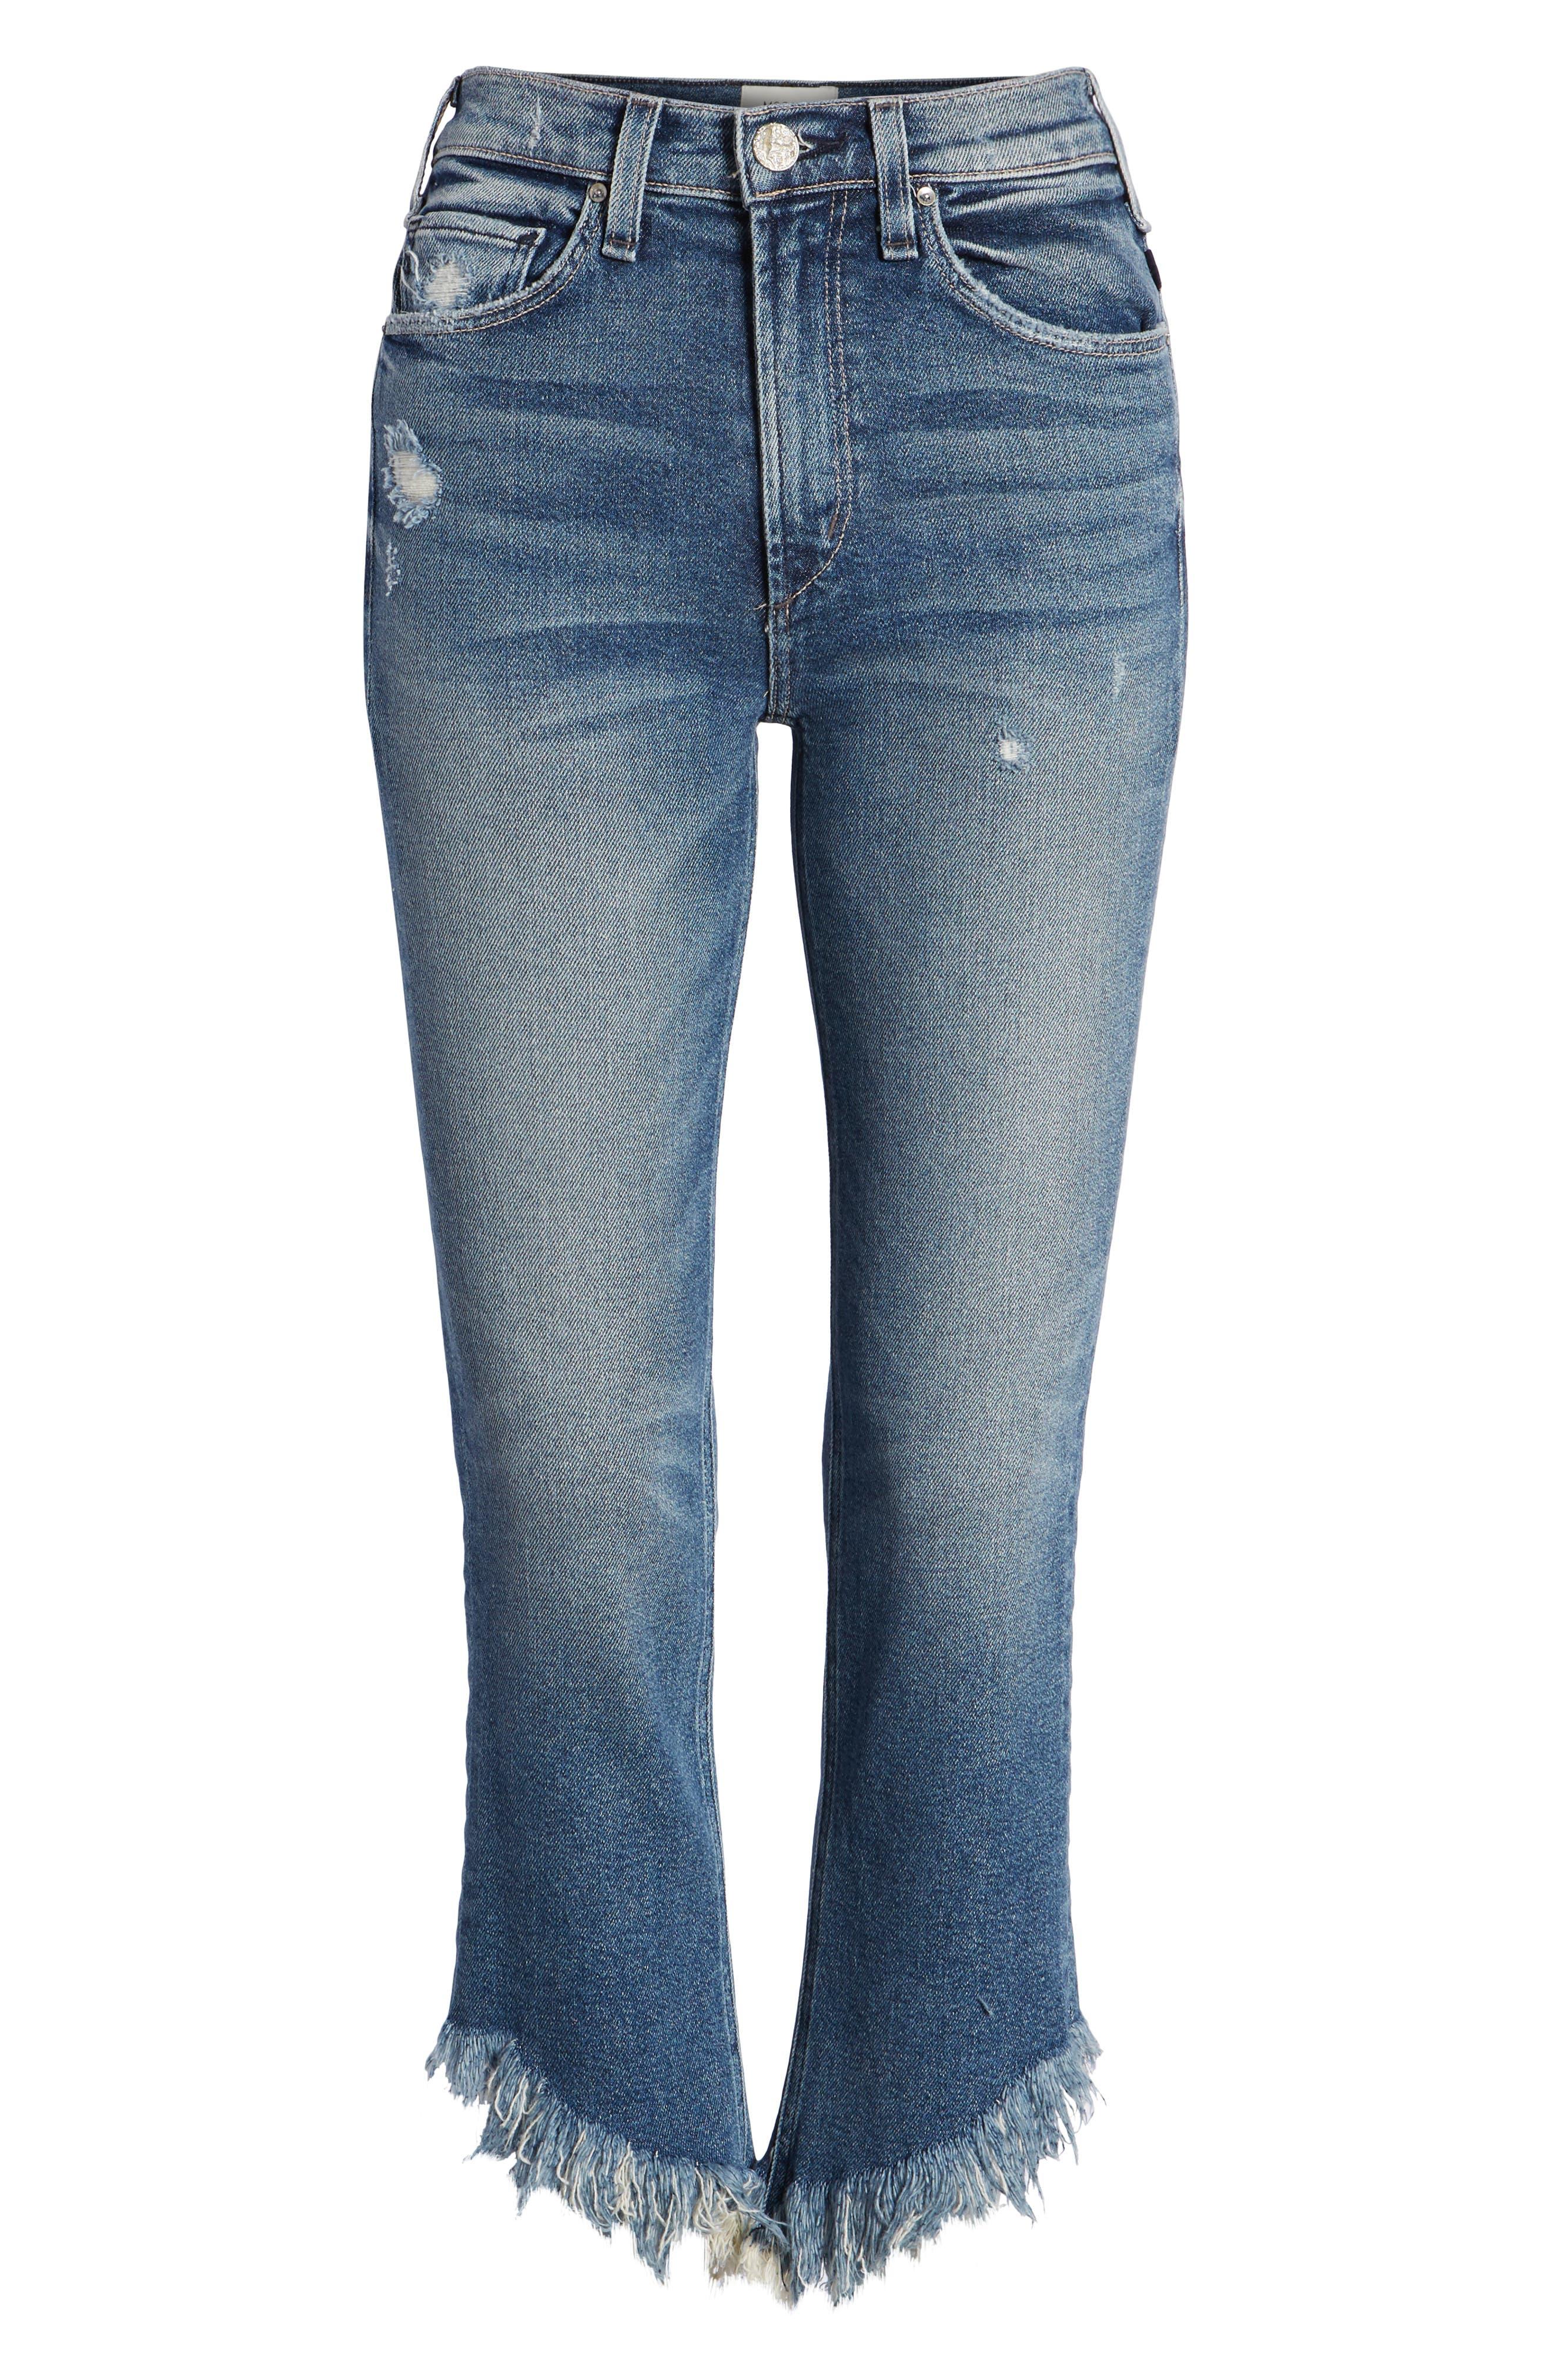 Valletta High Waist Crop Straight Leg Jeans,                             Alternate thumbnail 6, color,                             450